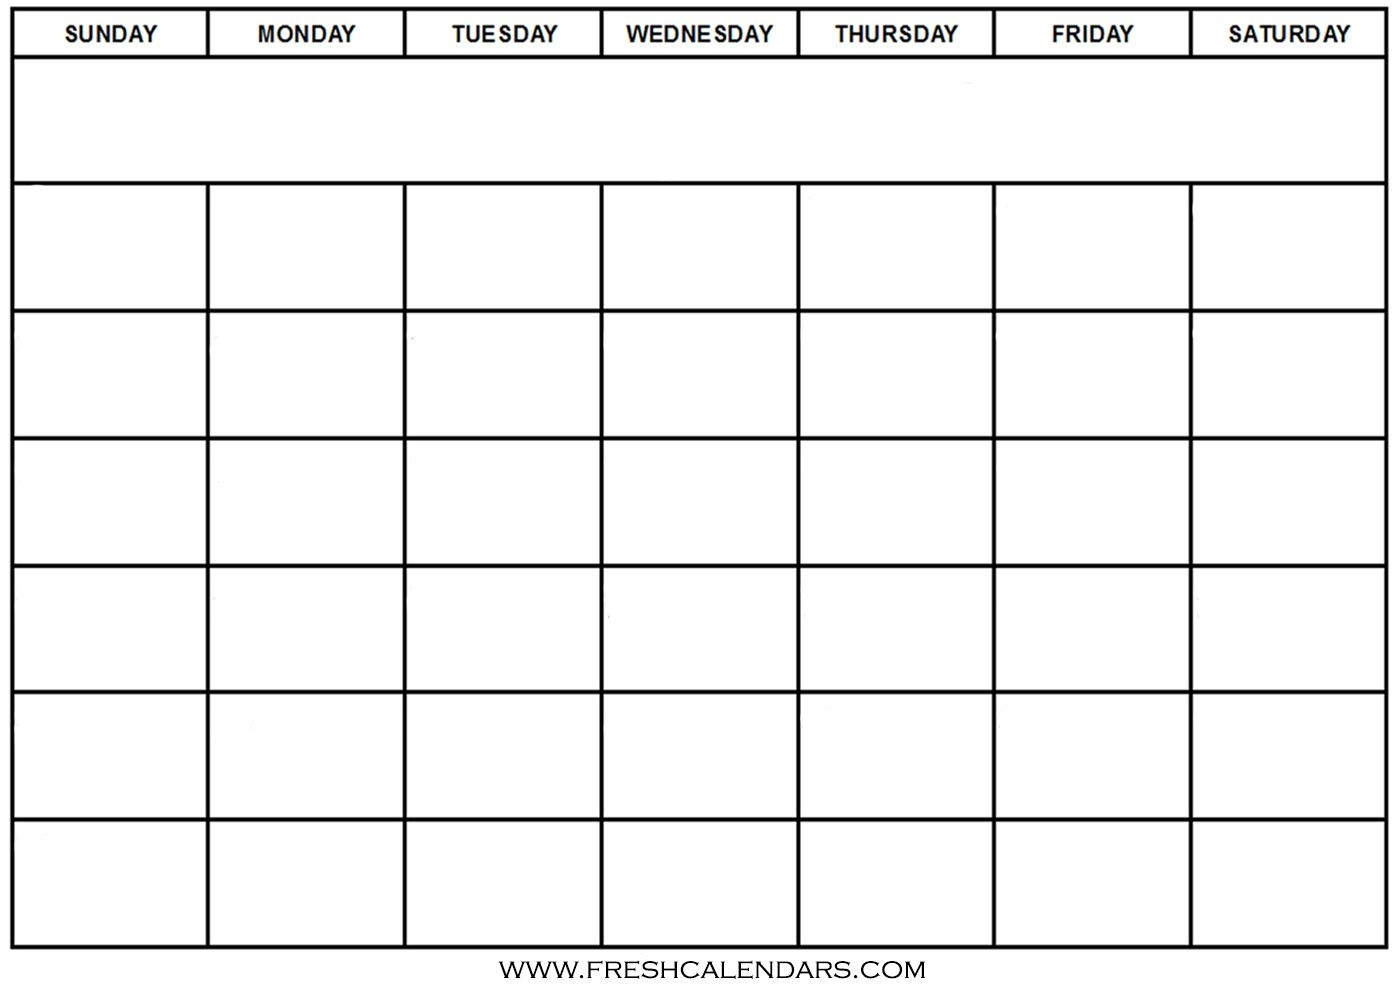 Free Printable Blank Calendar 2020 inside Free Printable Calendar With Lines